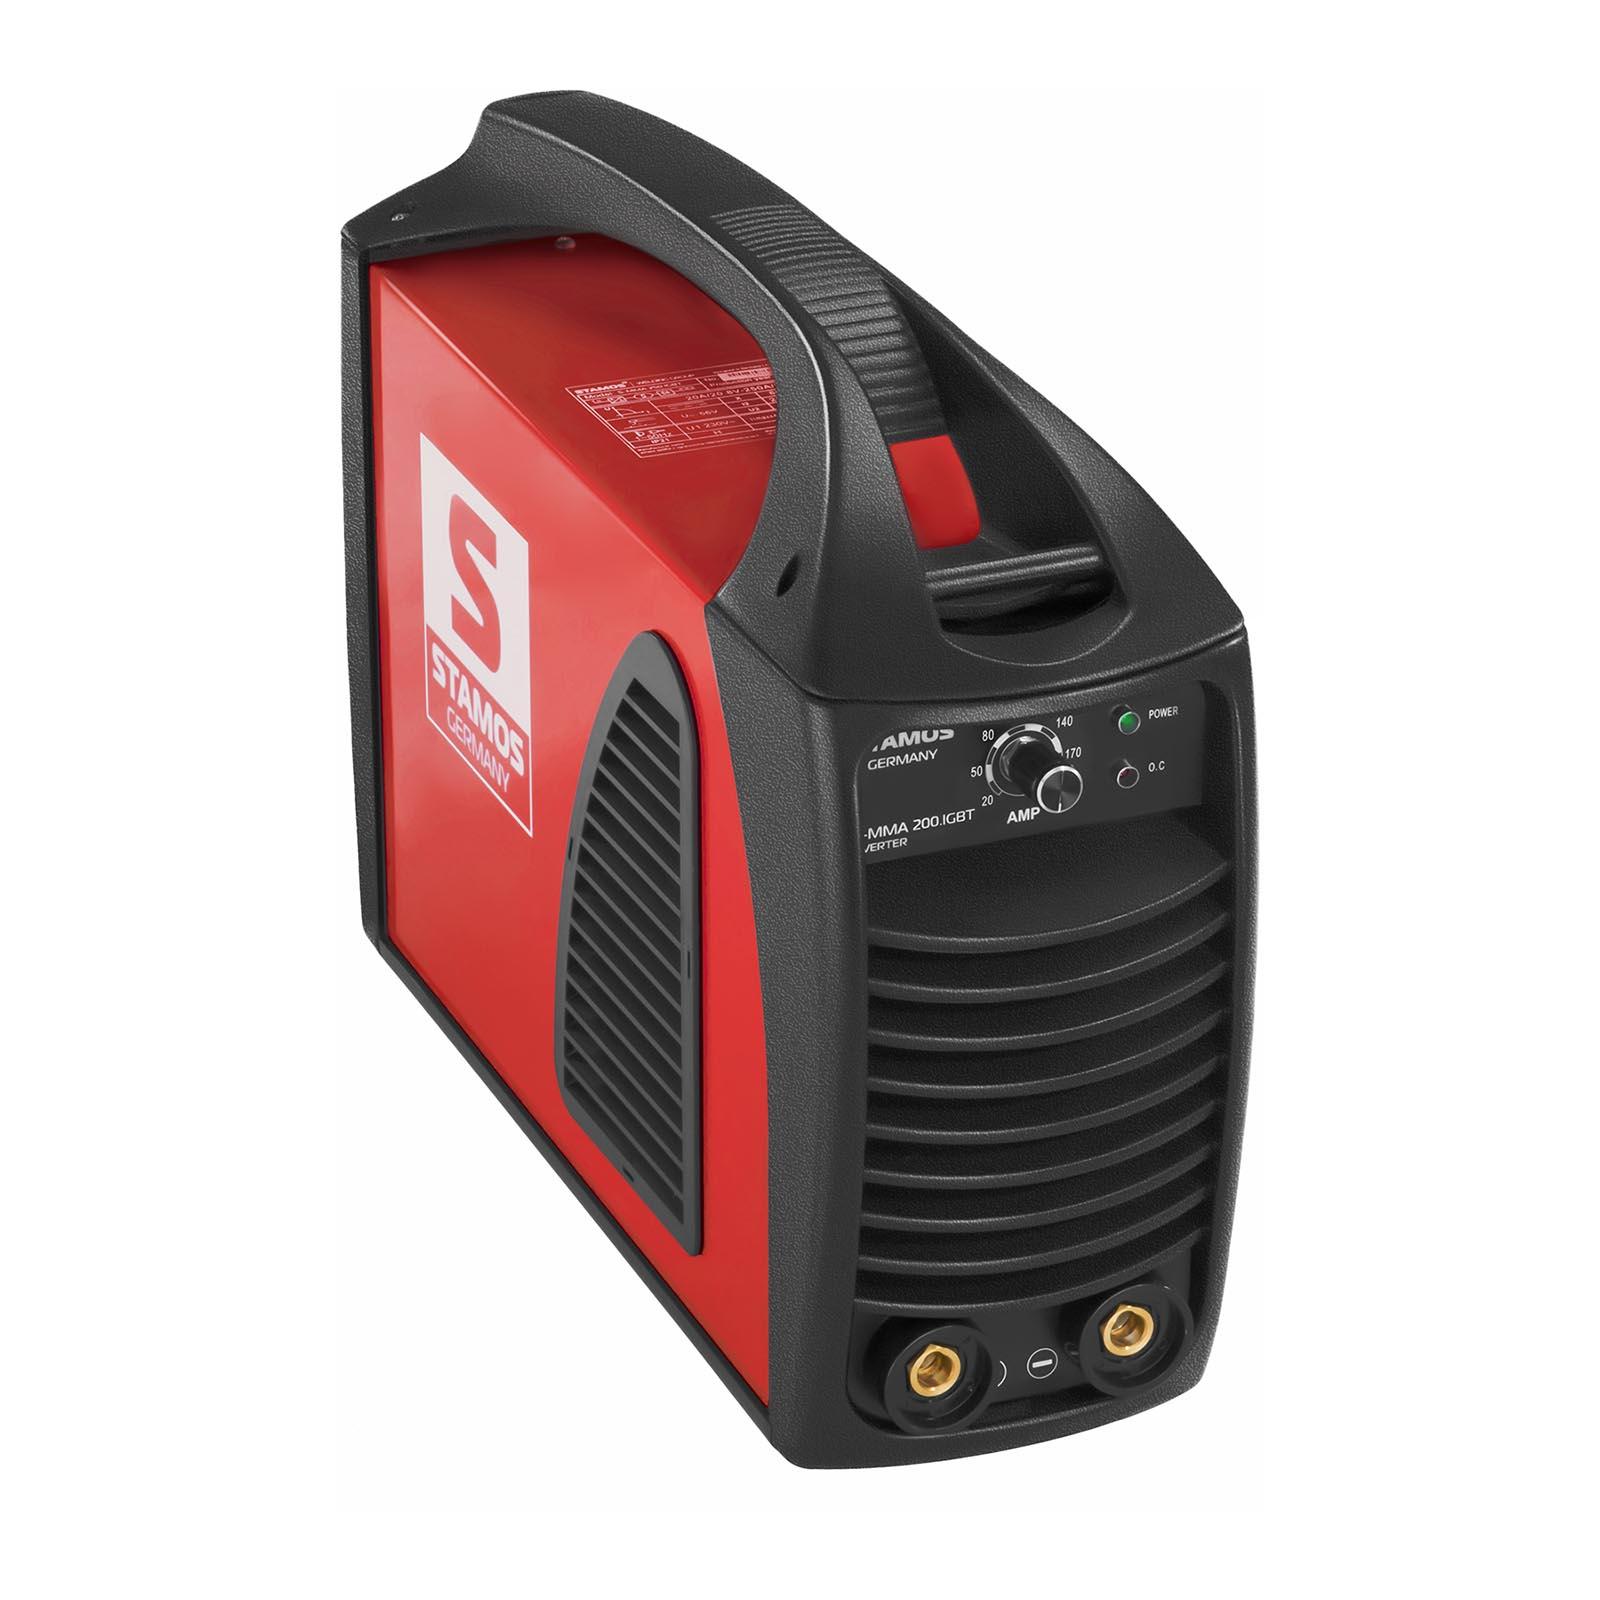 Stamos Germany Elektrodesveiseapparat - 200 A - Hot Start - IGBT 10020202